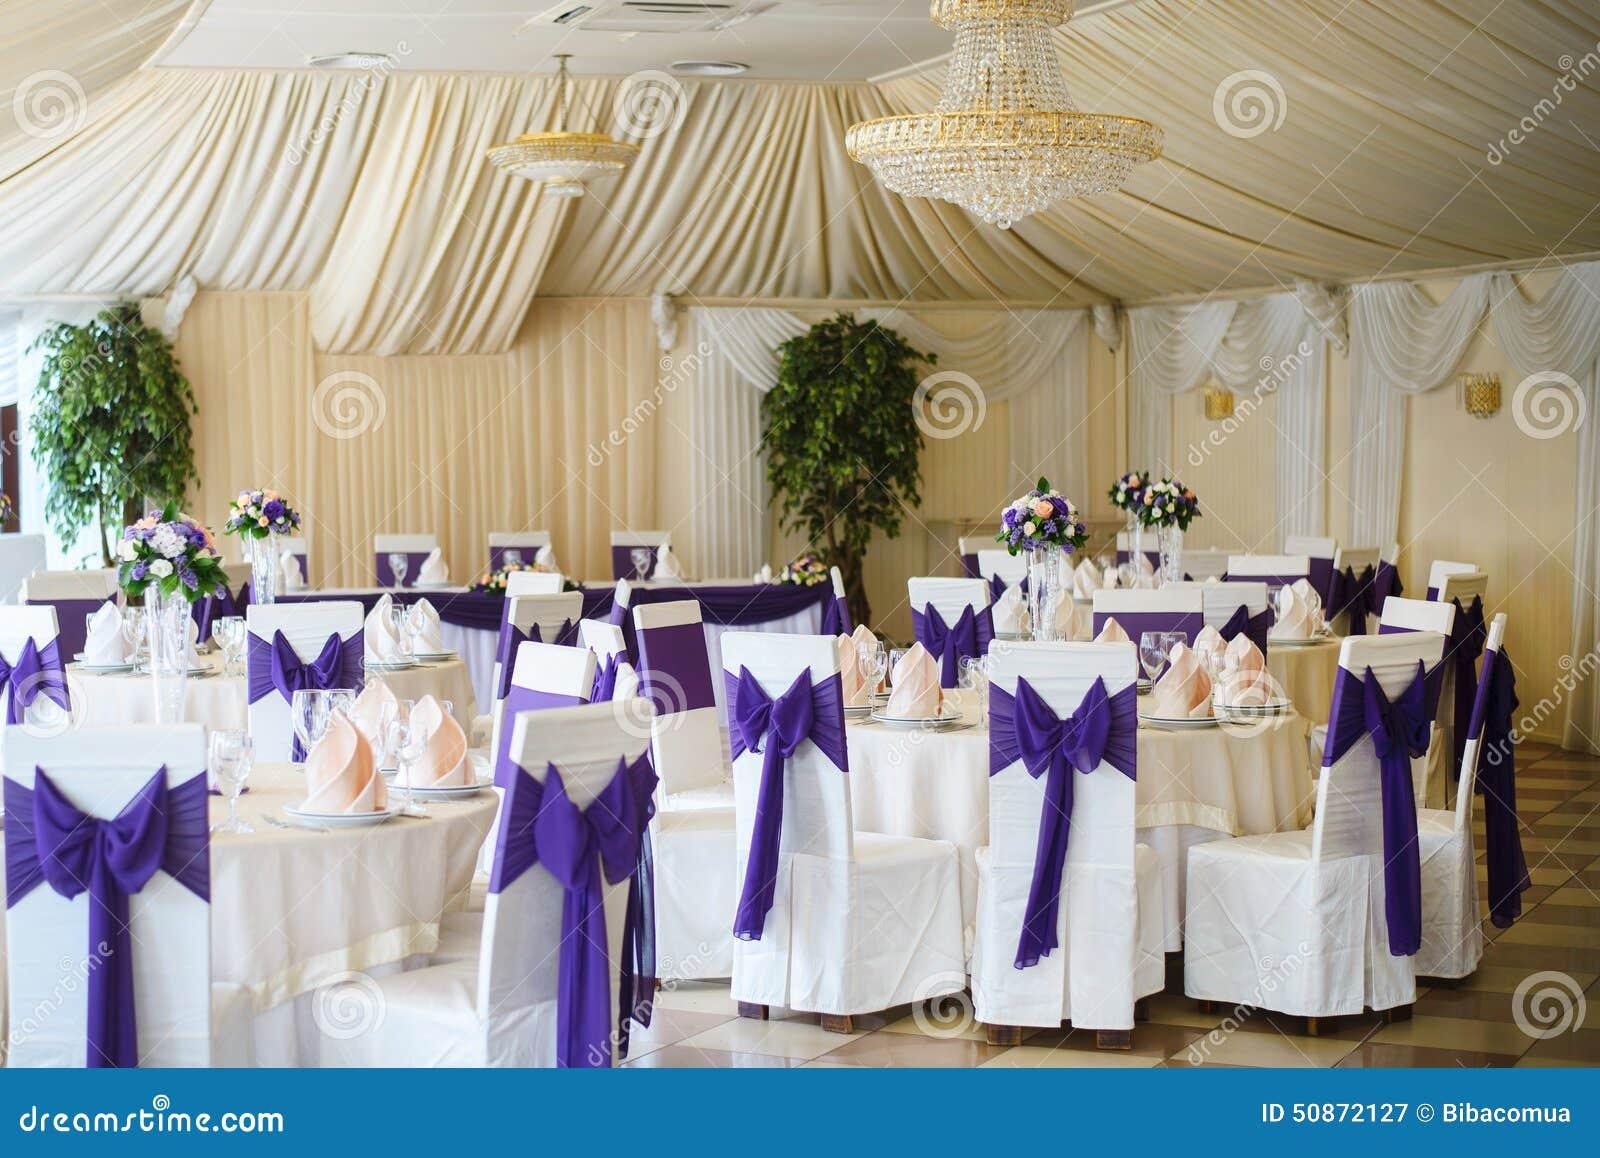 Wedding Chair And Table Setting Stock Image - Image: 50872127